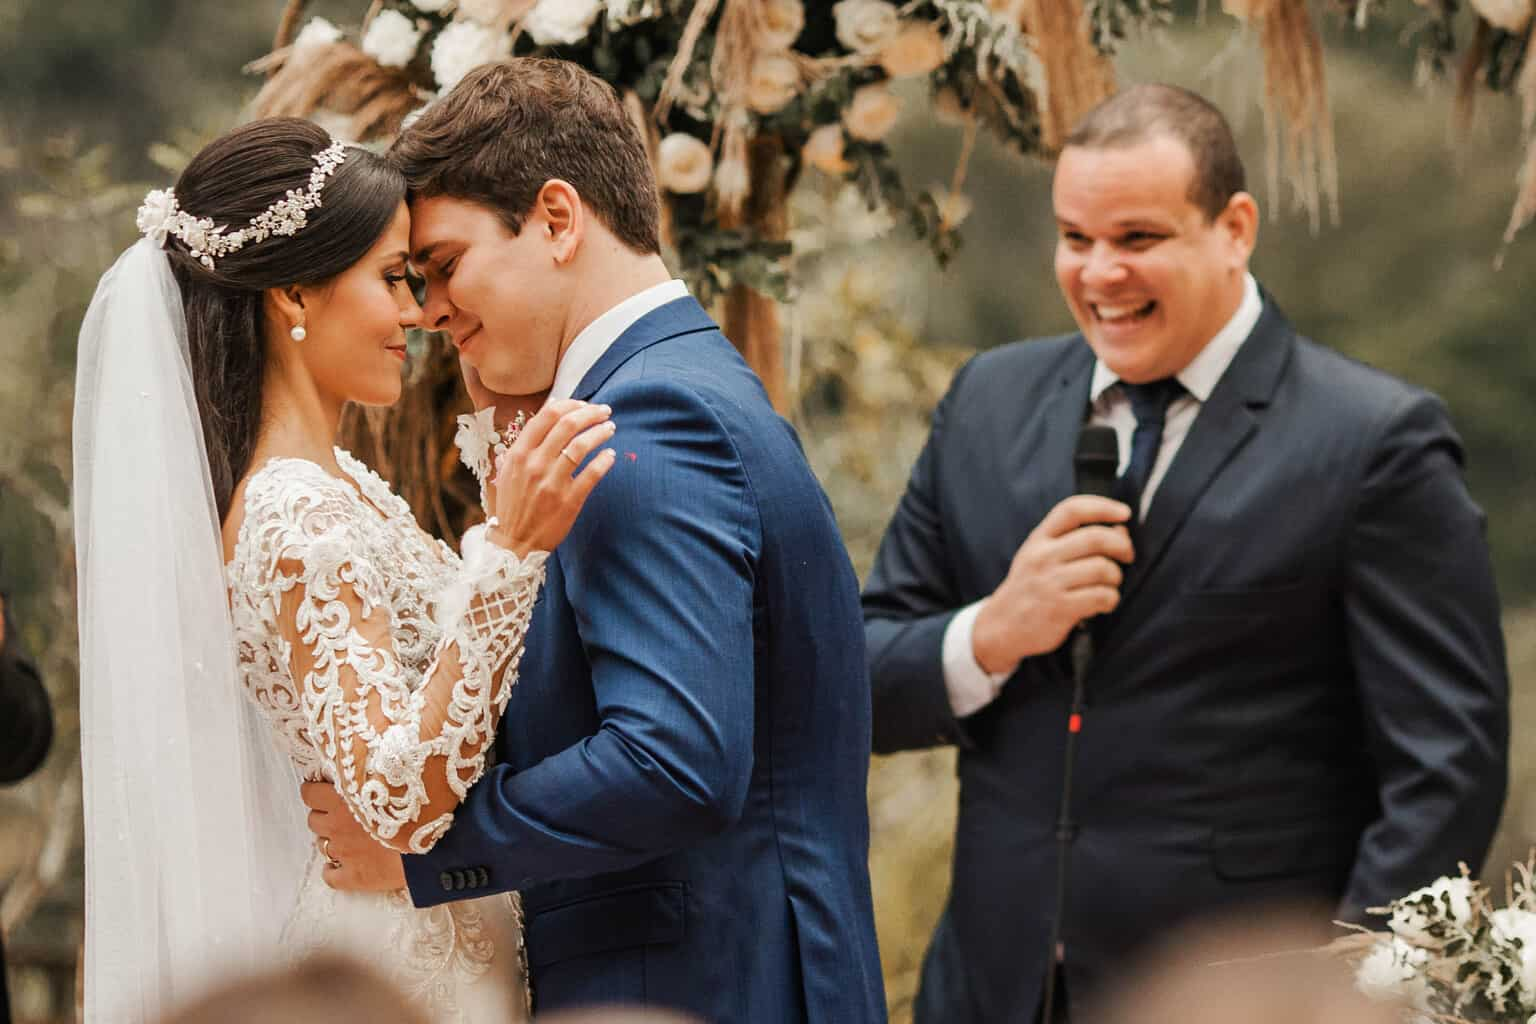 casamento-Beatriz-e-Joao-Fernando-cerimonia-ao-ar-livre-Itaipava-Locanda-Della-Mimosa-Thienny-Tammis170